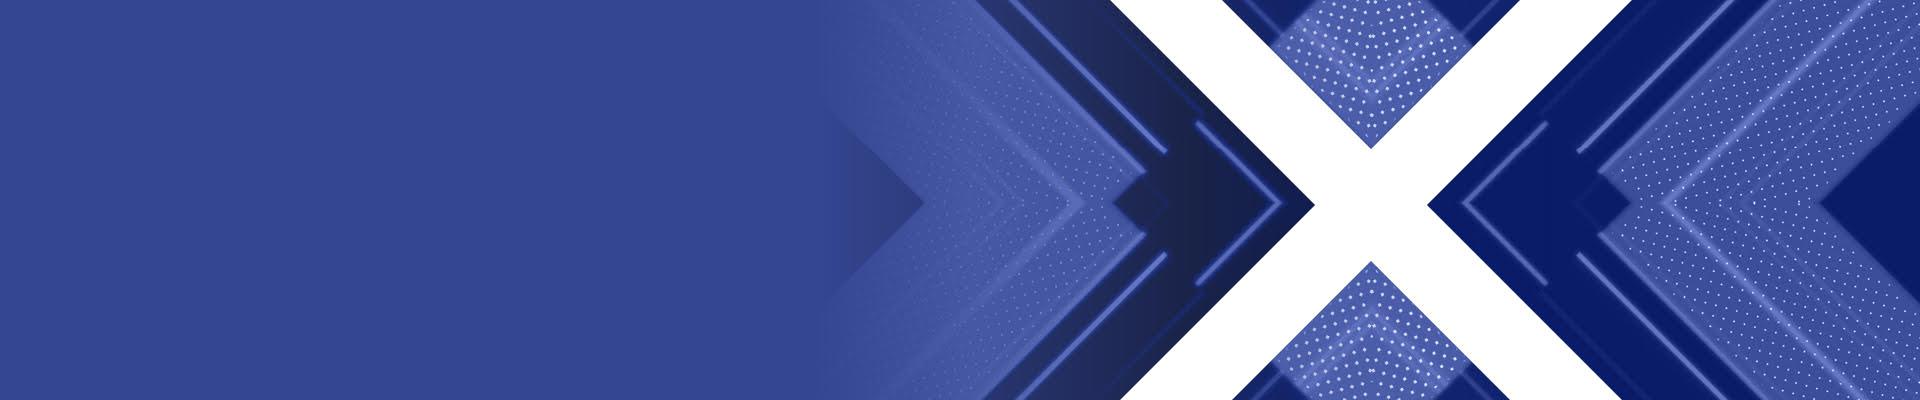 Technyl® MAX Glass Fiber Reinforced Polymers